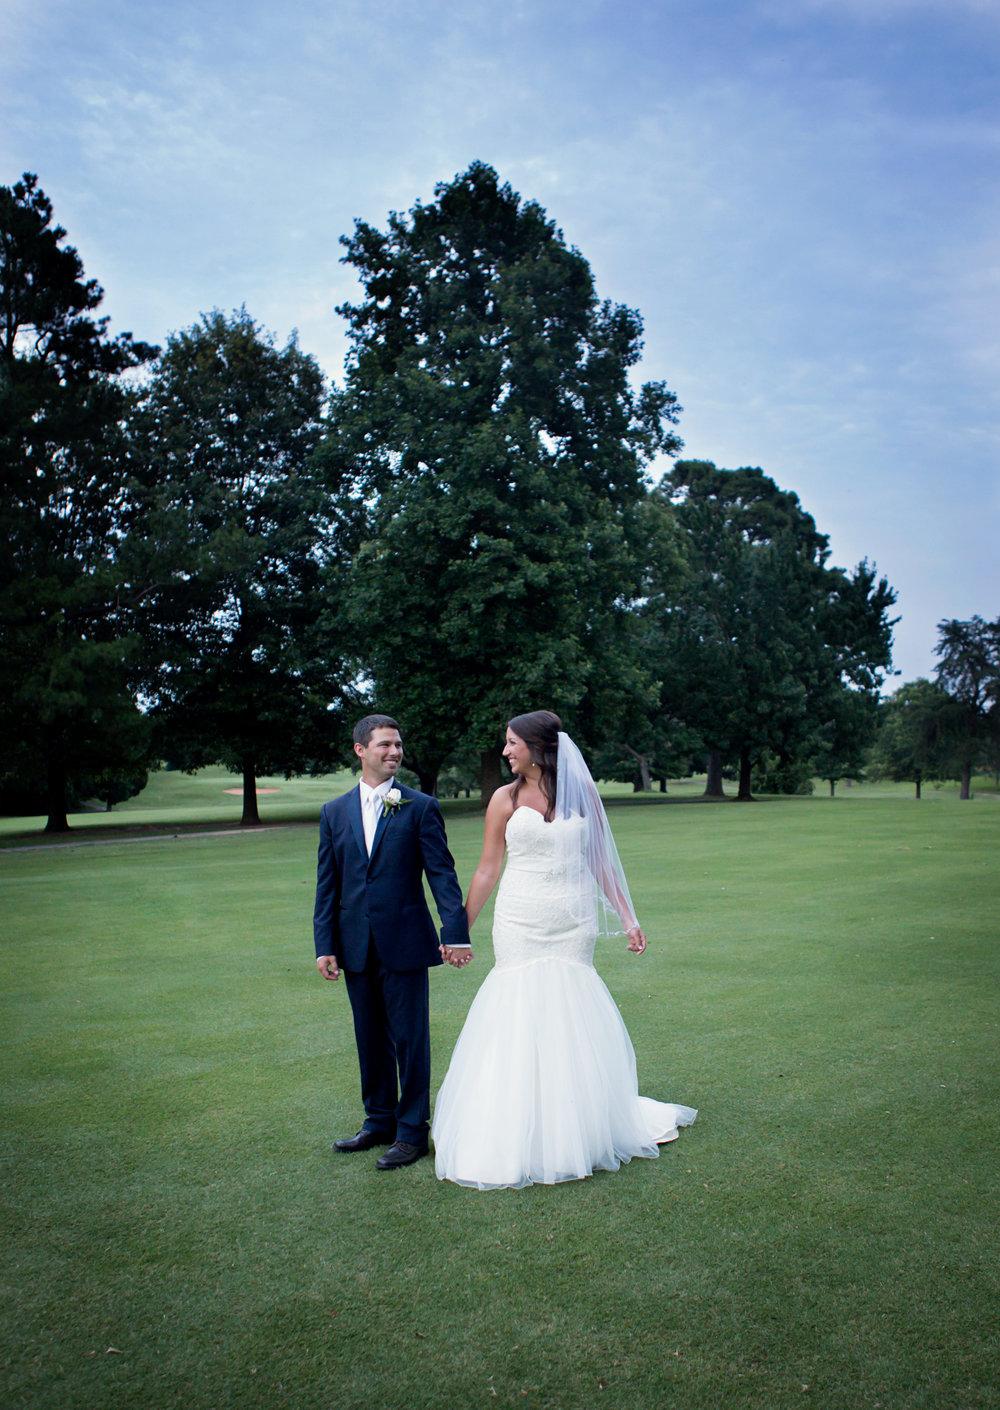 Southall Wedding 1165.jpg